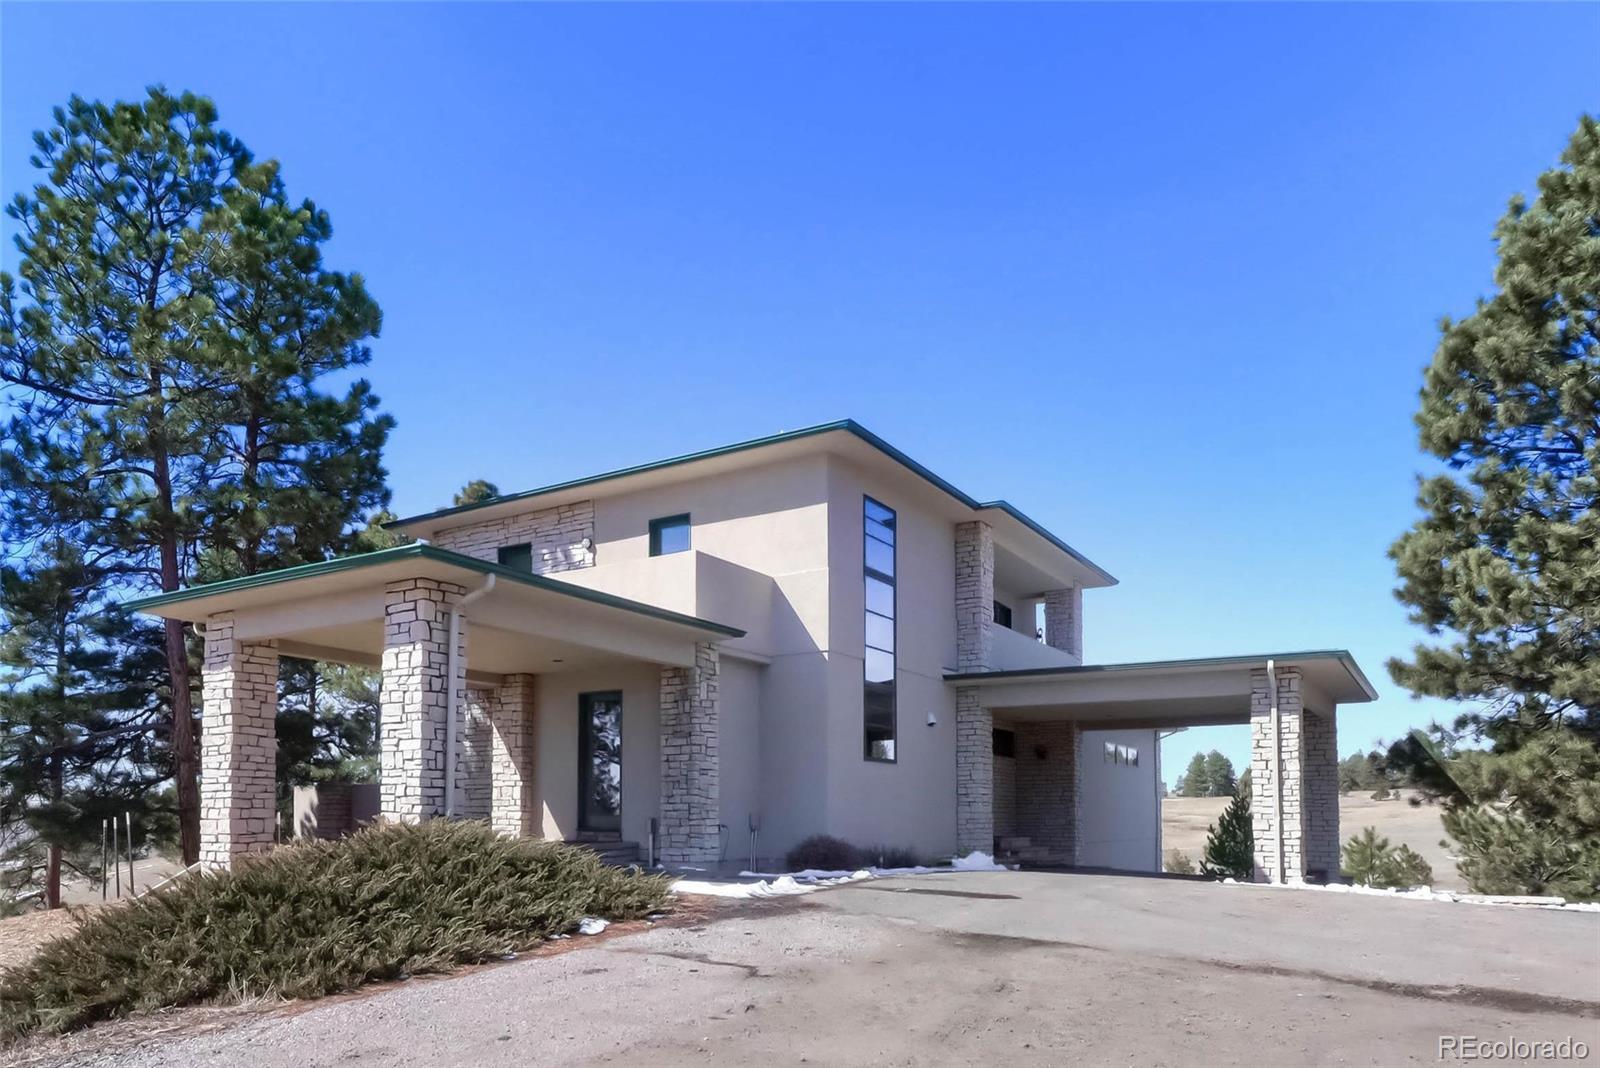 40273 County Road 13, Elizabeth, CO